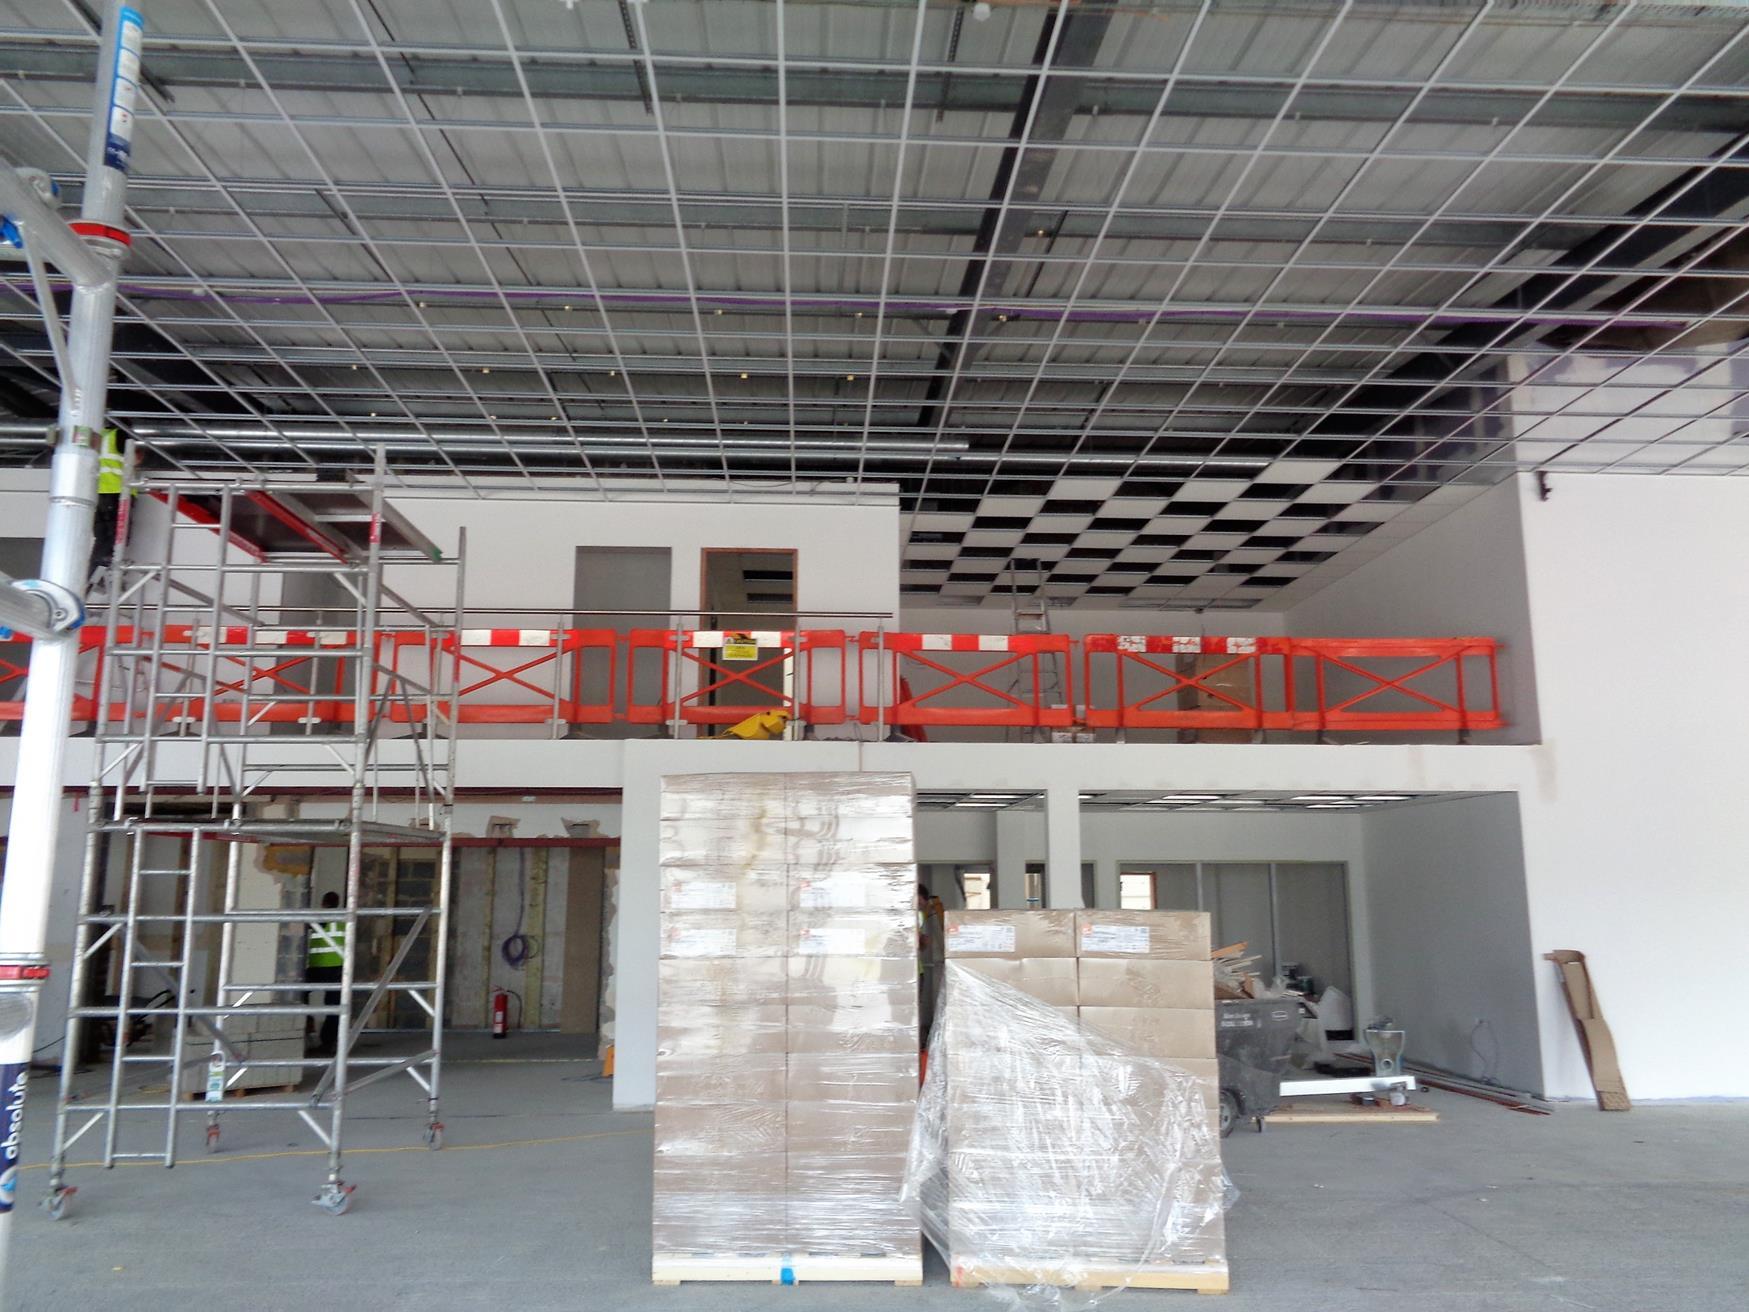 Mezzanine maximises use of space